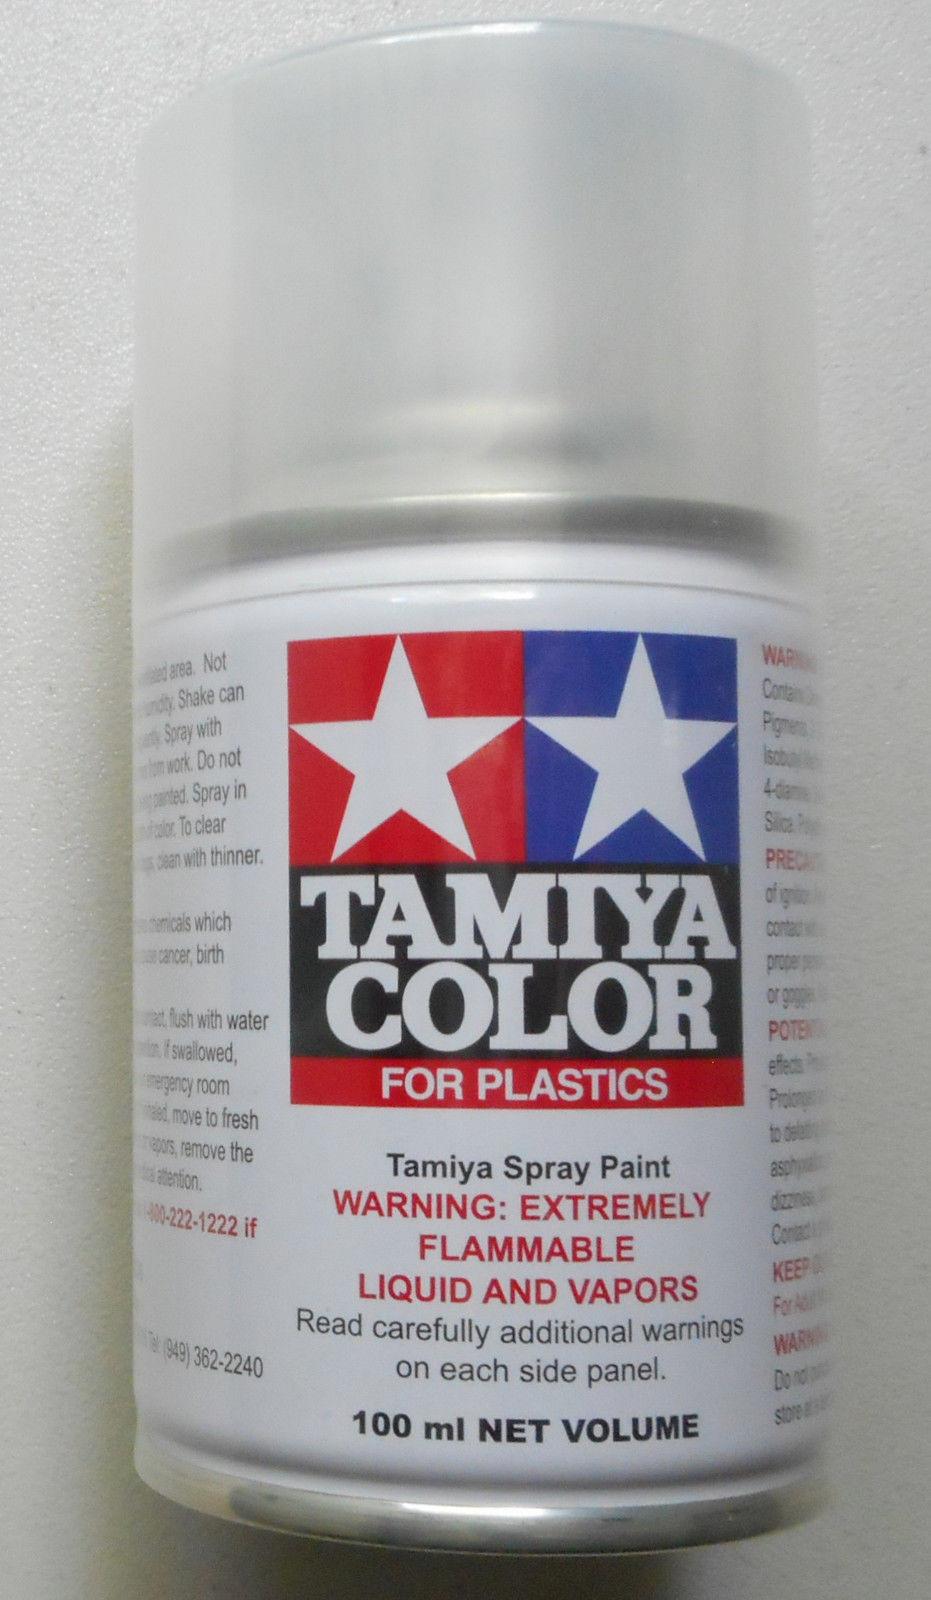 Semi Gloss Clear Lacquer Spray Tamiya Paint Hobby Modeling TS-79